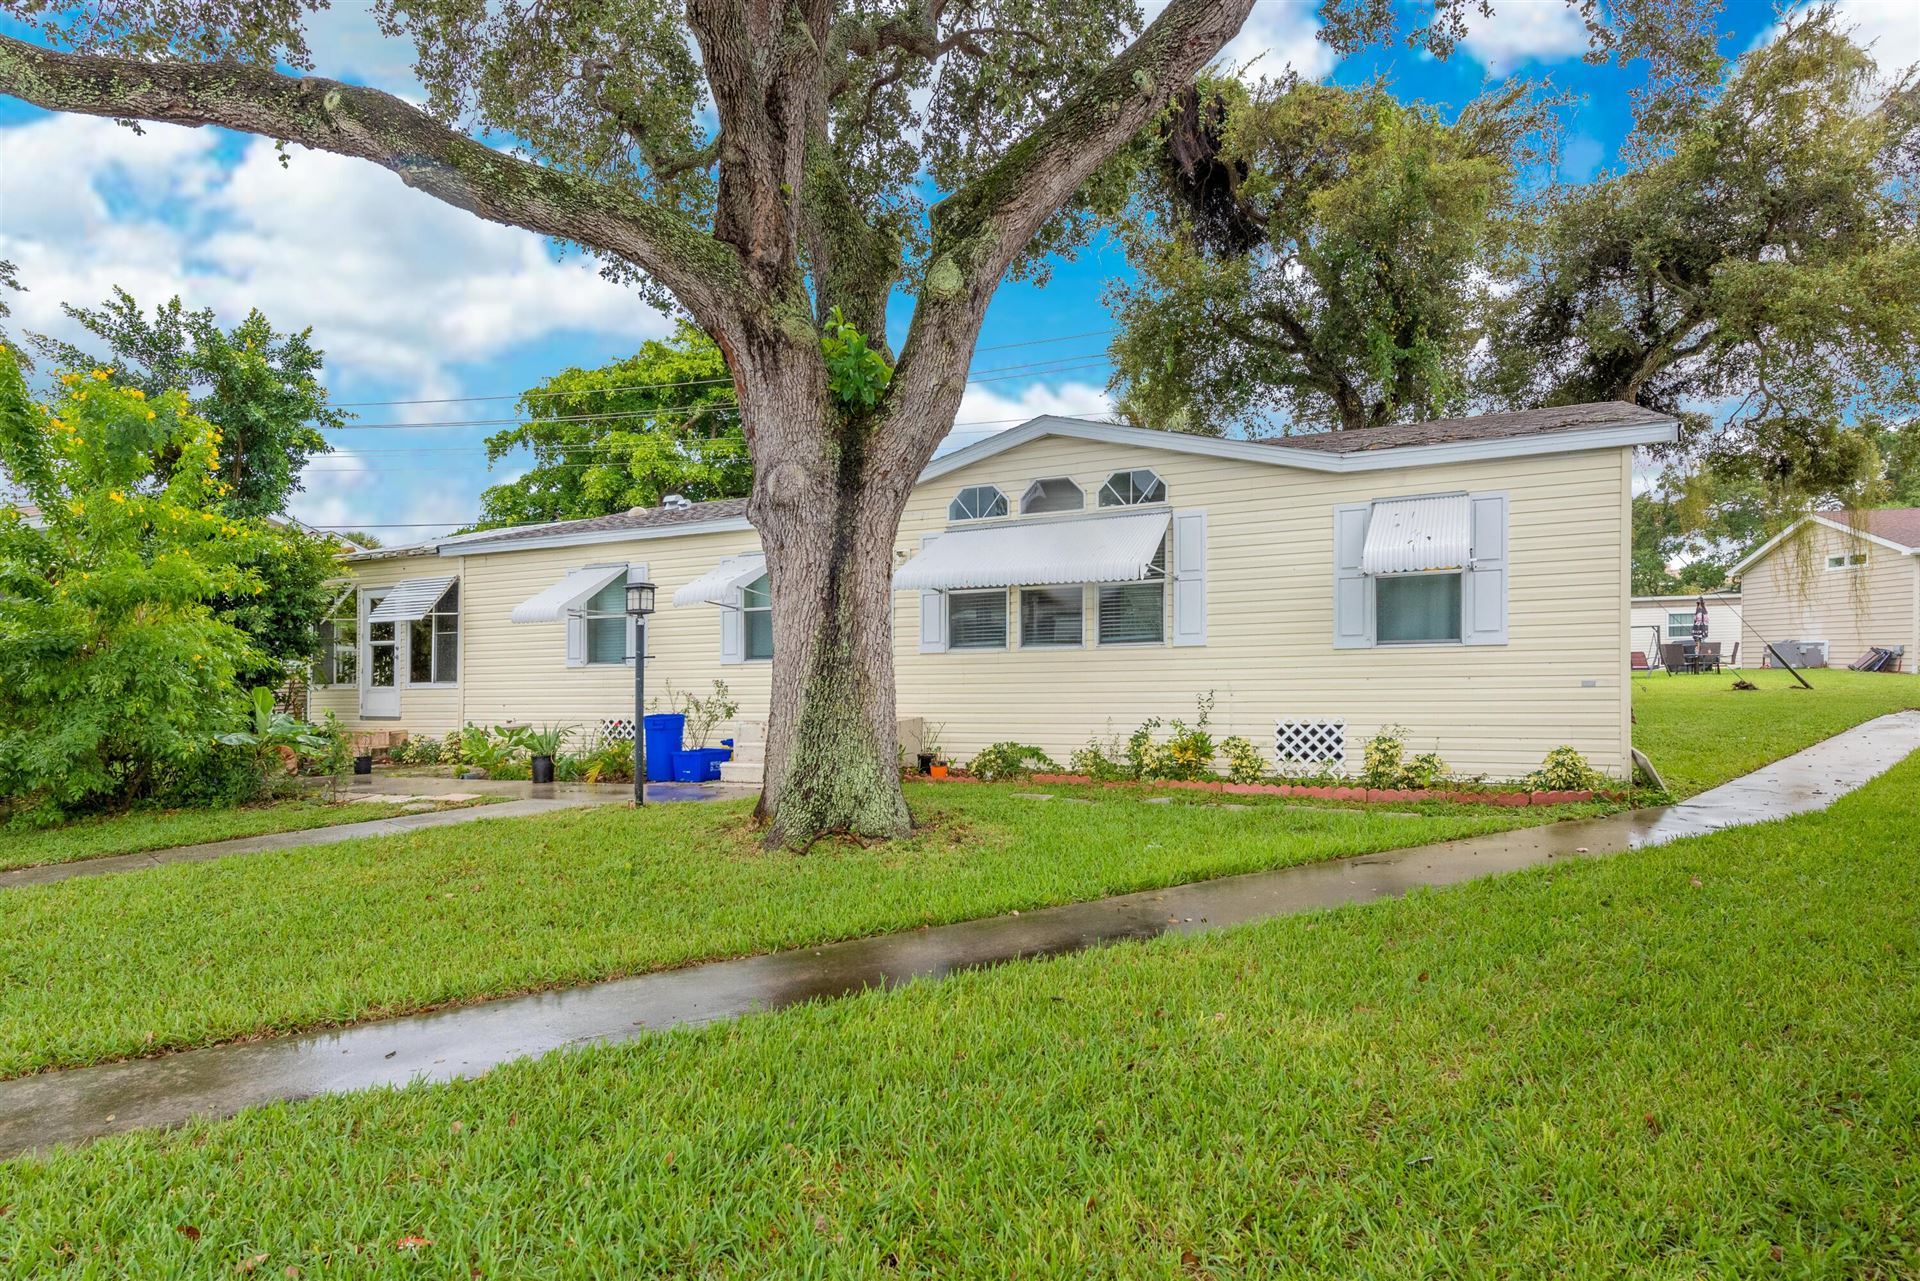 2555 Pga Boulevard #134, Palm Beach Gardens, FL 33410 - MLS#: RX-10750001